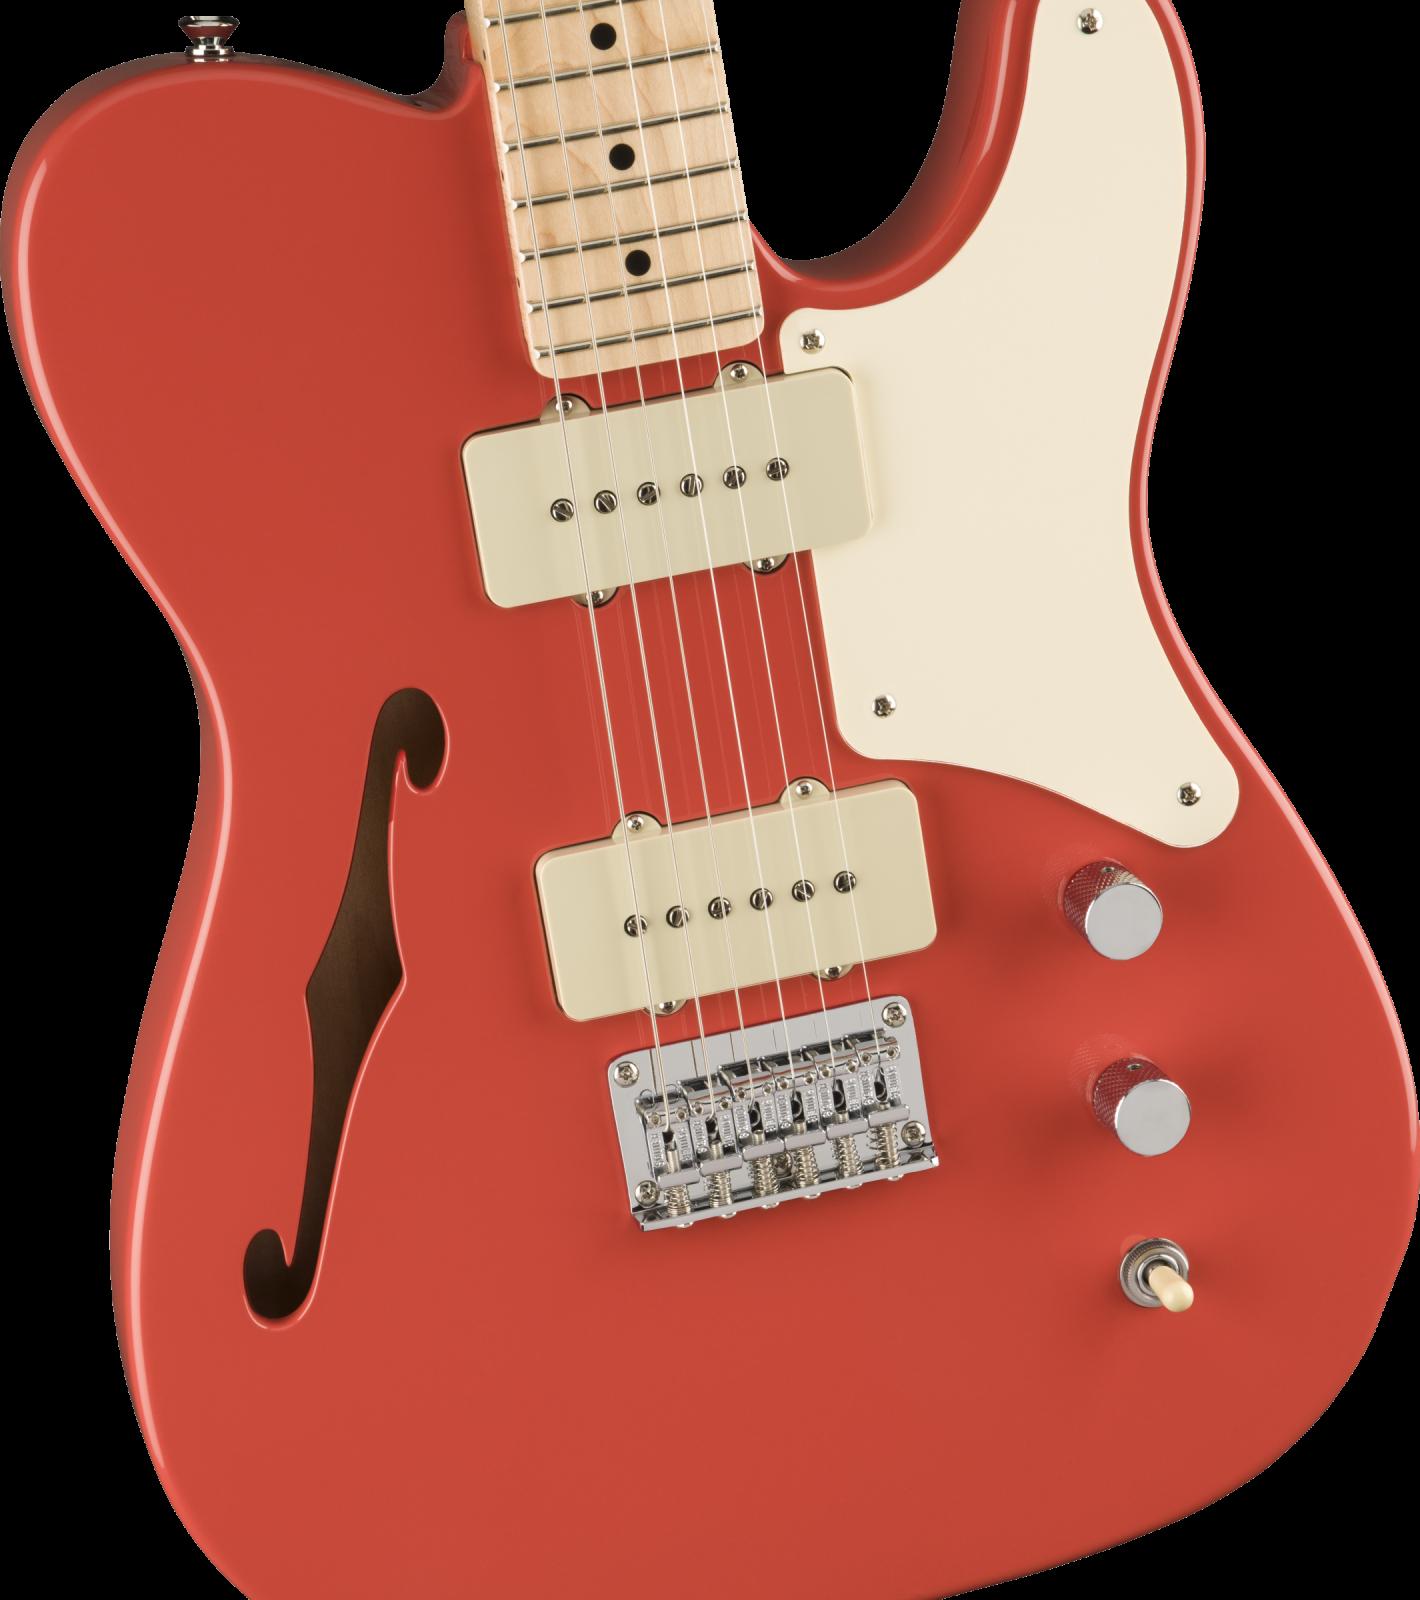 Squier Paranormal Cabronita Telecaster Thinline - Fiesta Red